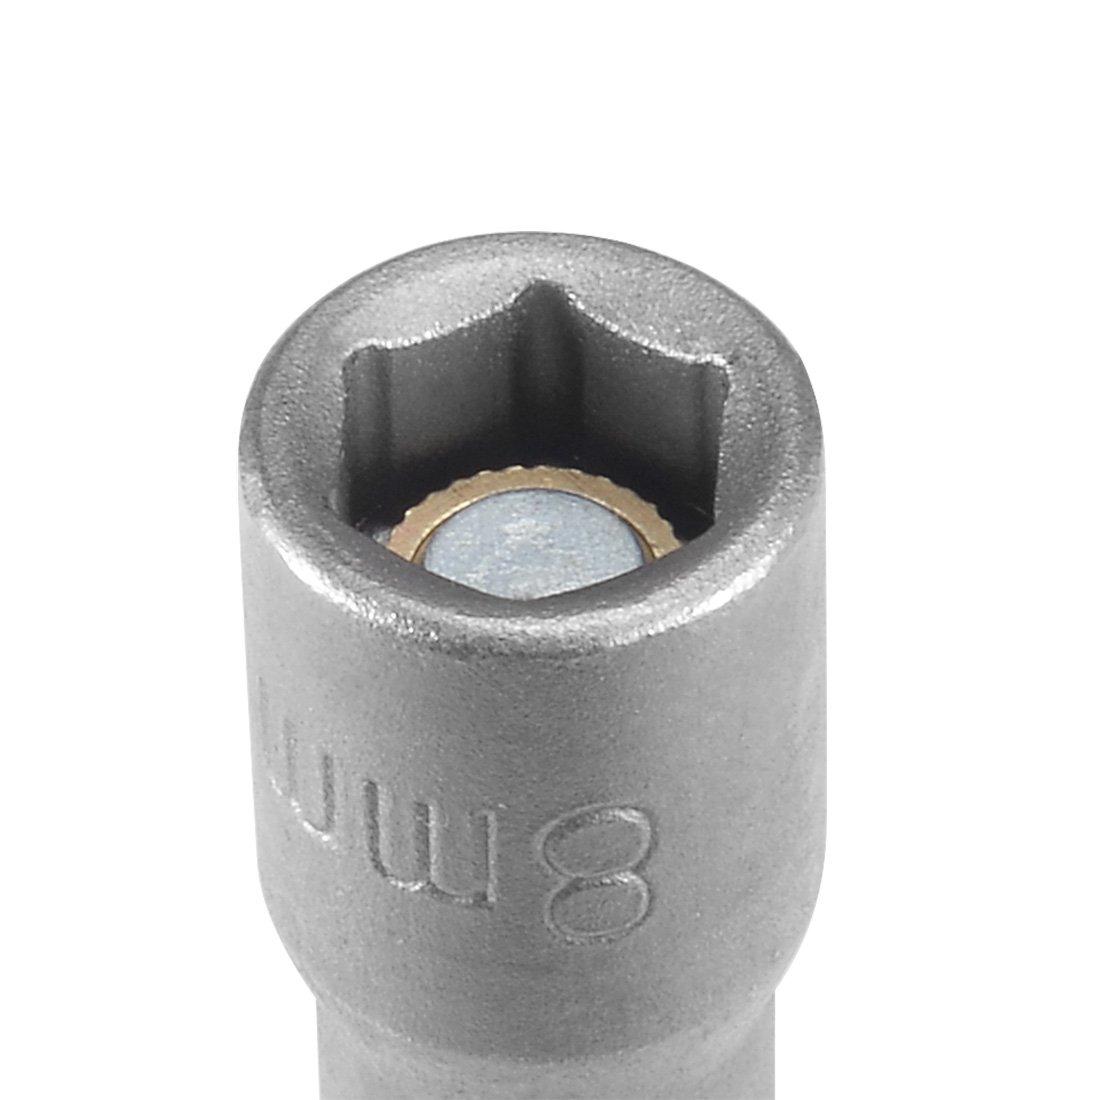 2.5 Length uxcell/® 5Pcs 1//4 Inch Quick Change Shank Cr-V 7mm Magnetic Nut Setter